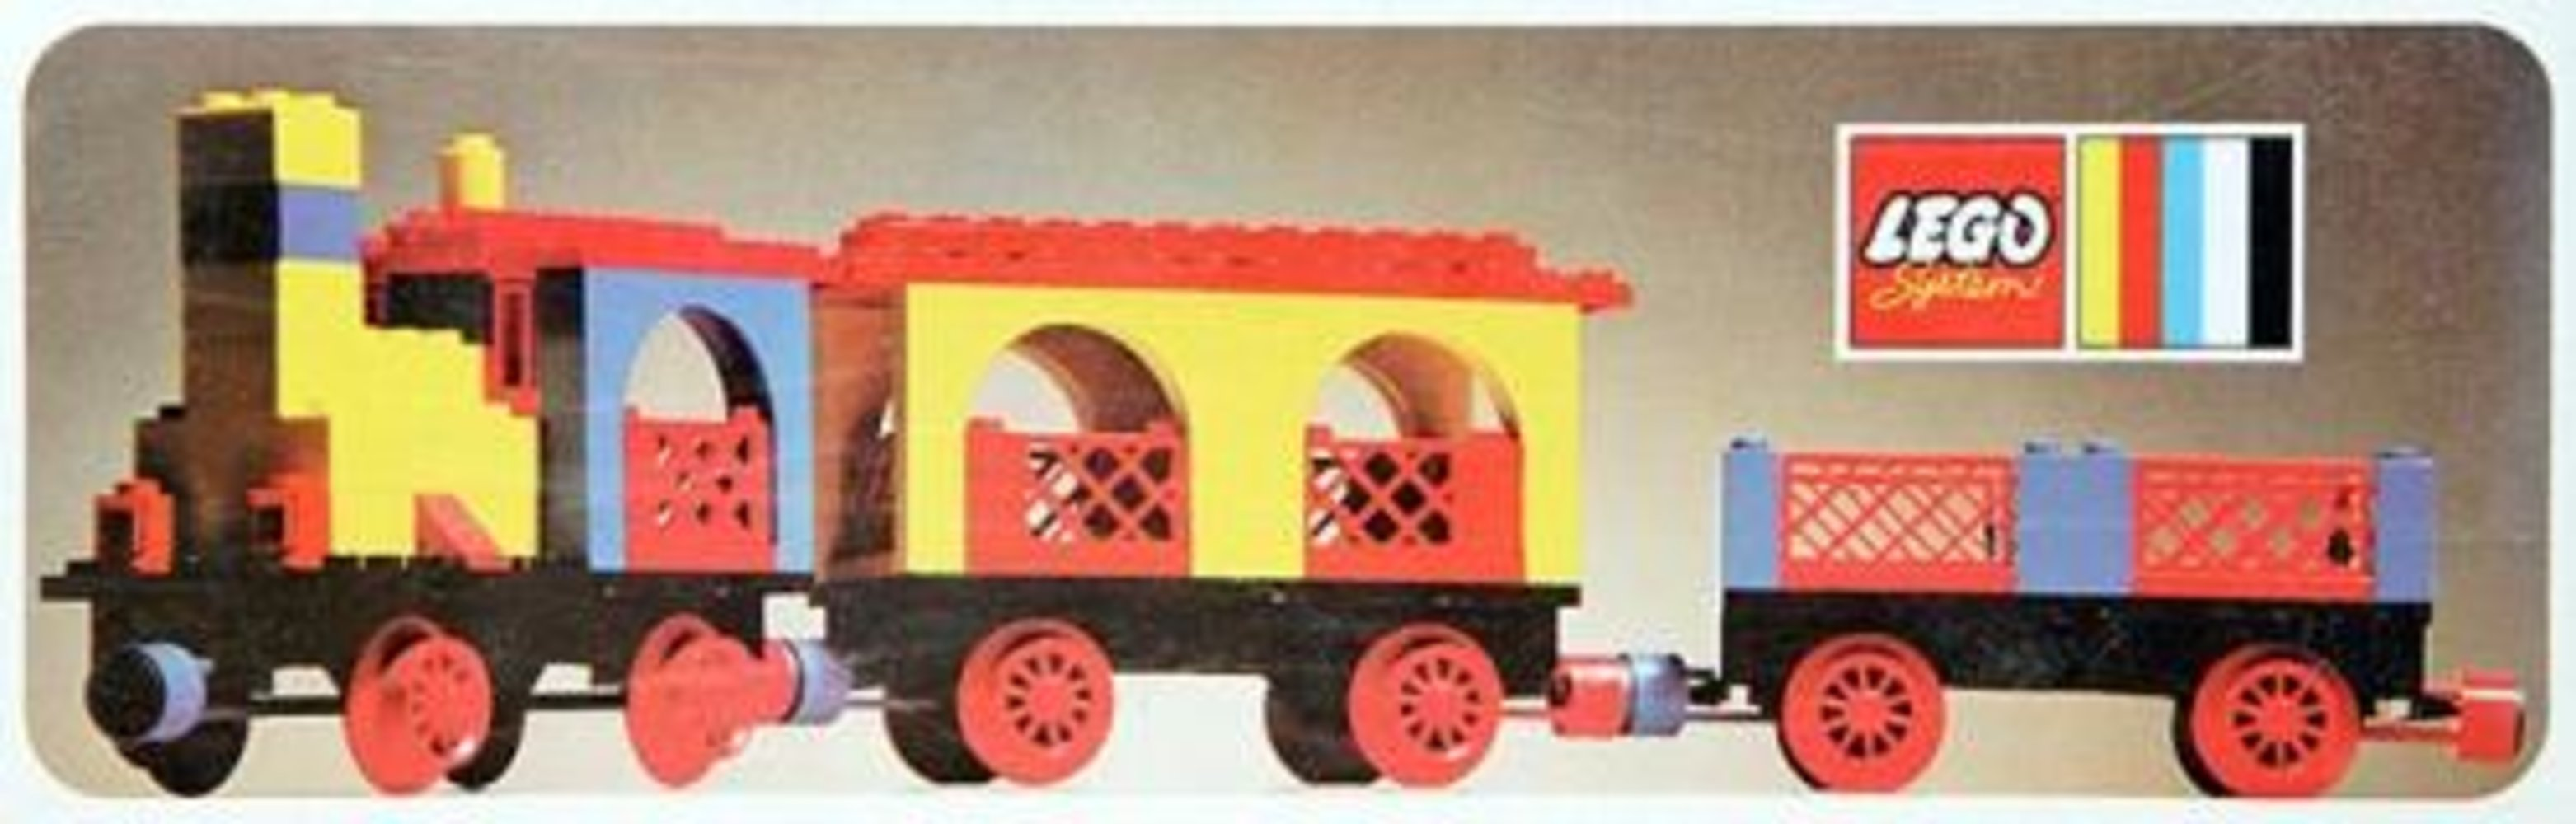 Push Along Play Train